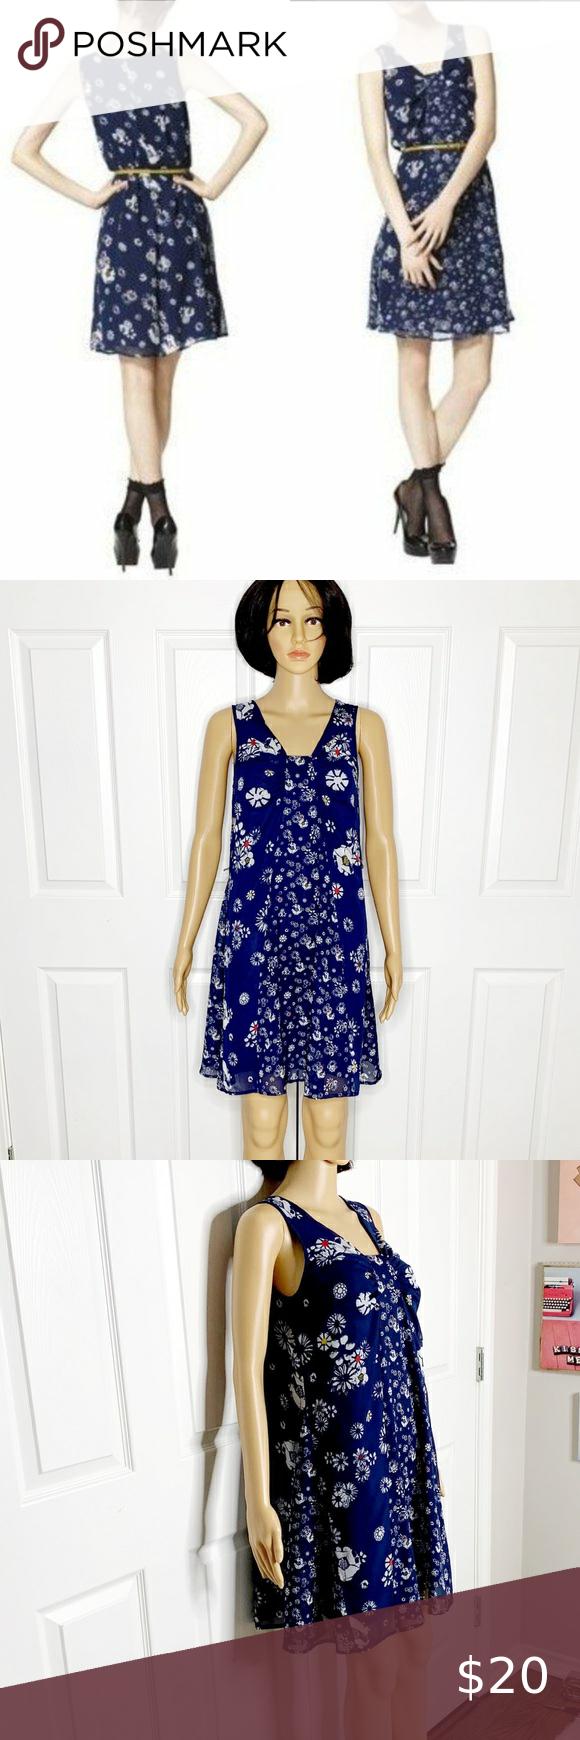 Jason Wu For Target Blue Floral Dress Size Xs Jason Wu Dress For Target Size Xs Beautiful Dress For Spring And Summer T Floral Blue Dress Floral Dress Dresses [ 1740 x 580 Pixel ]